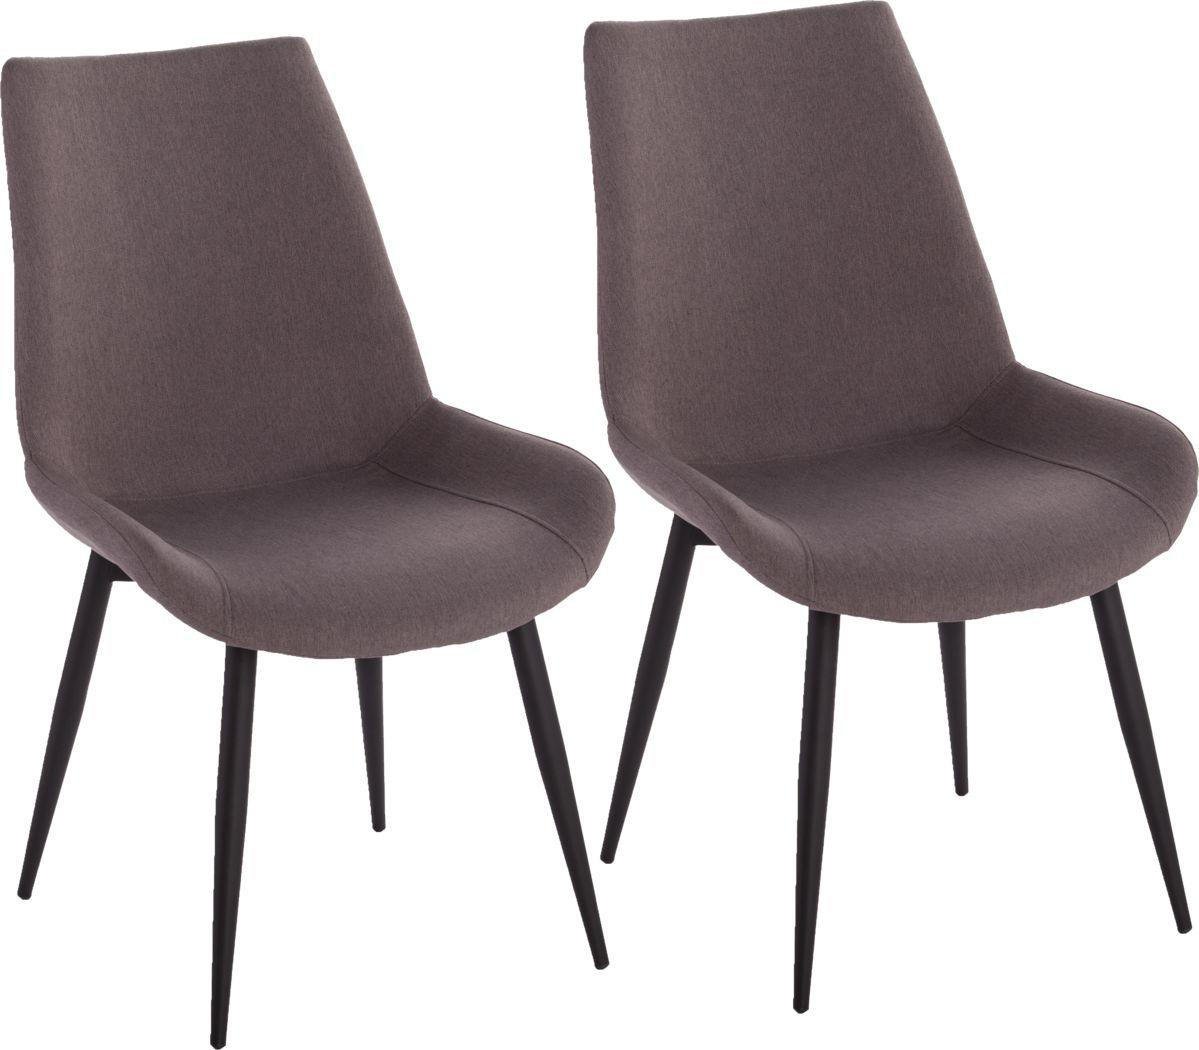 Taralane Gray Dining Chair, Set of 2